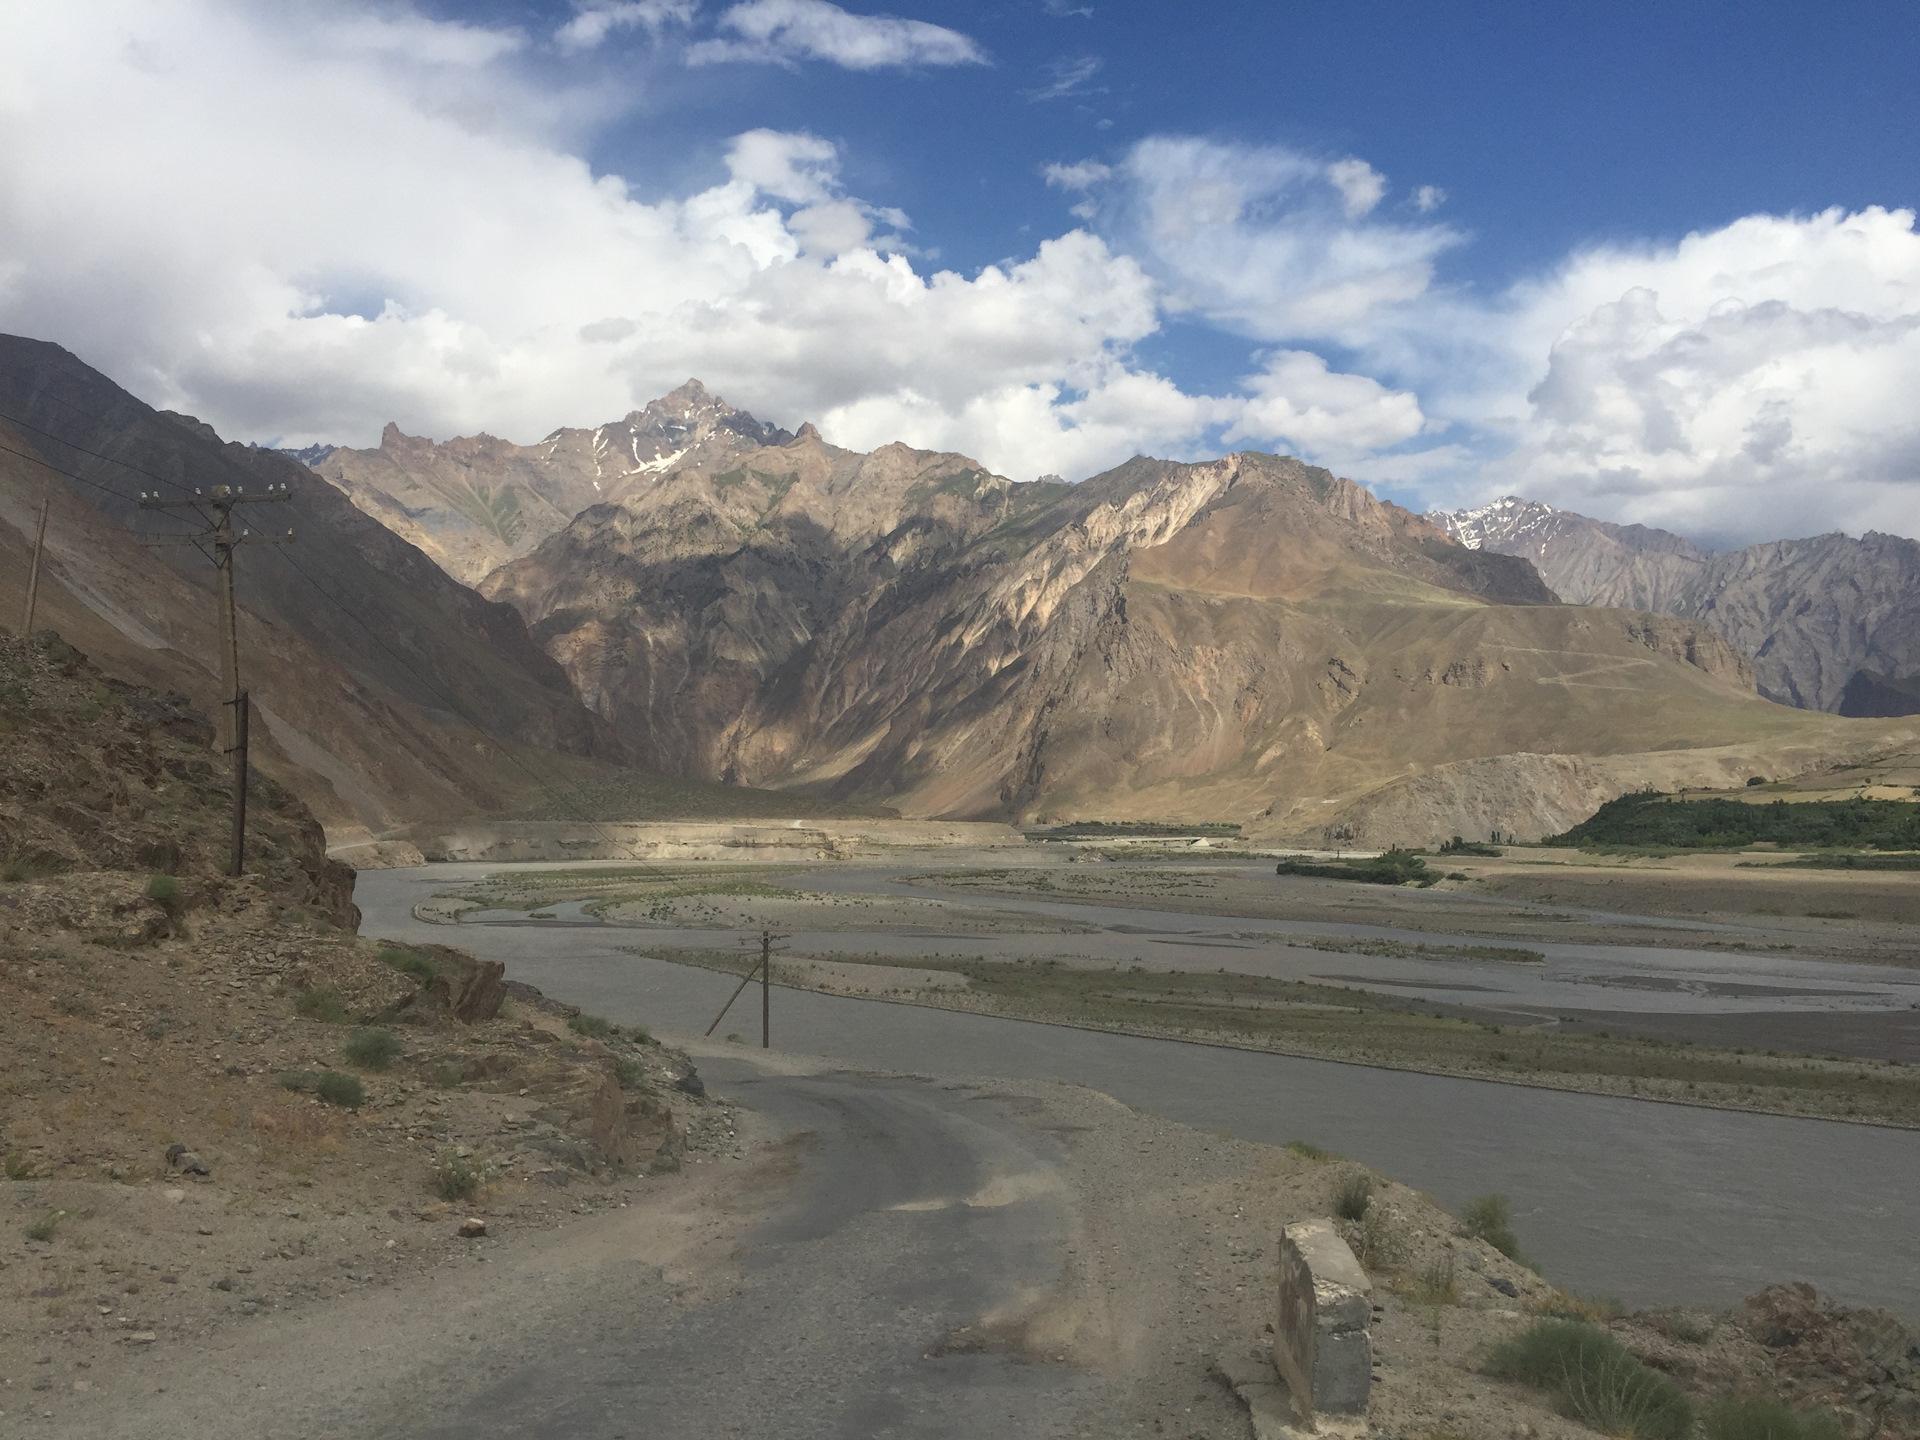 фото город пяндж таджикистан странный сон